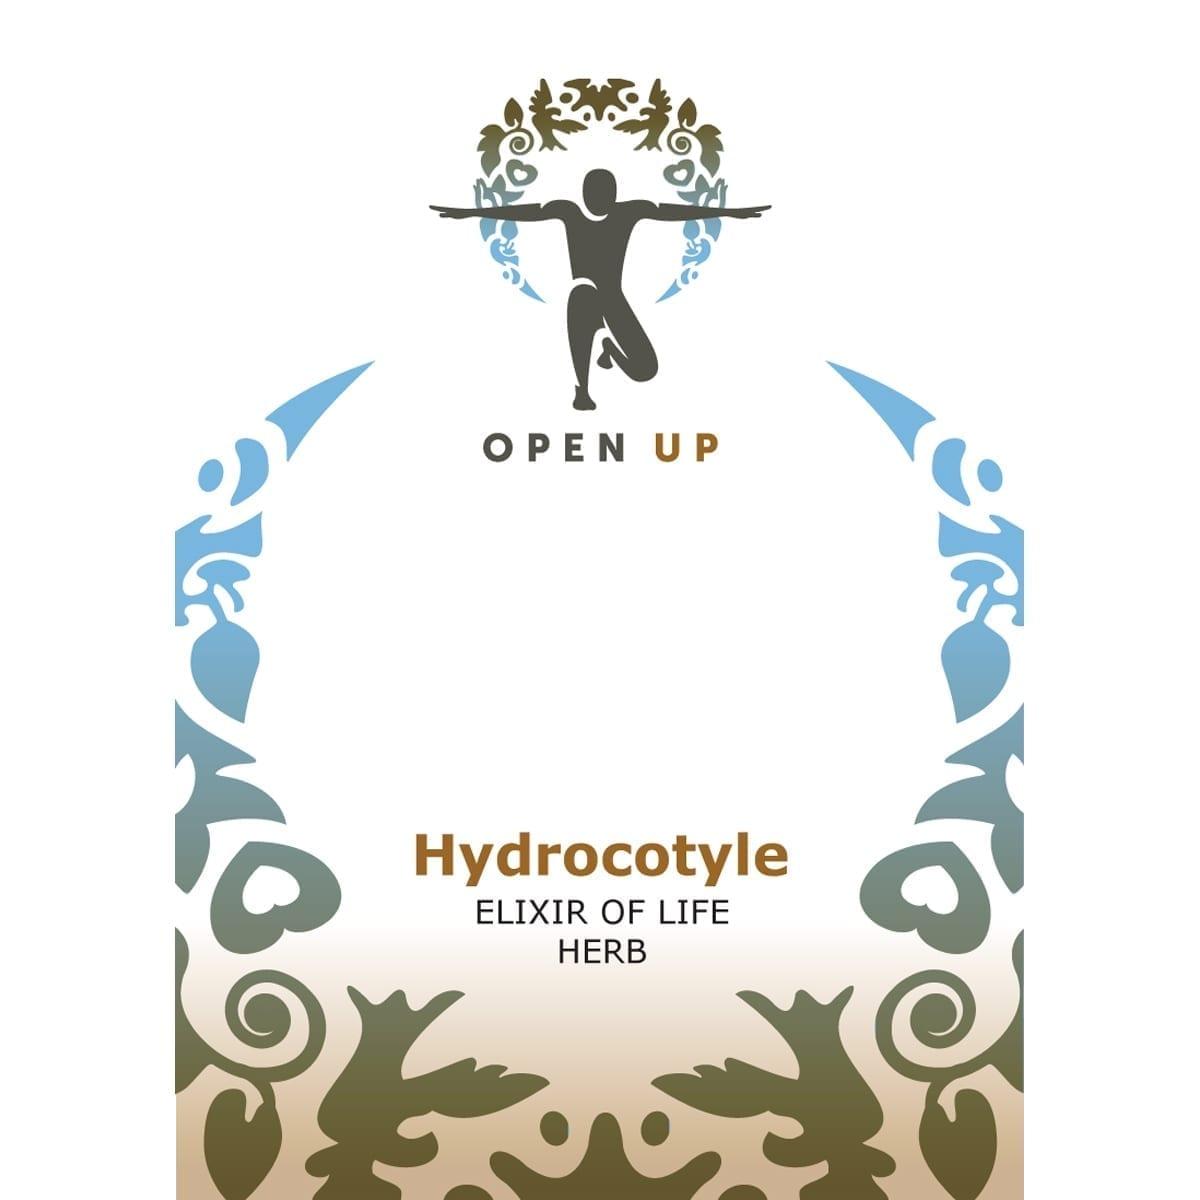 Hydrocotyle